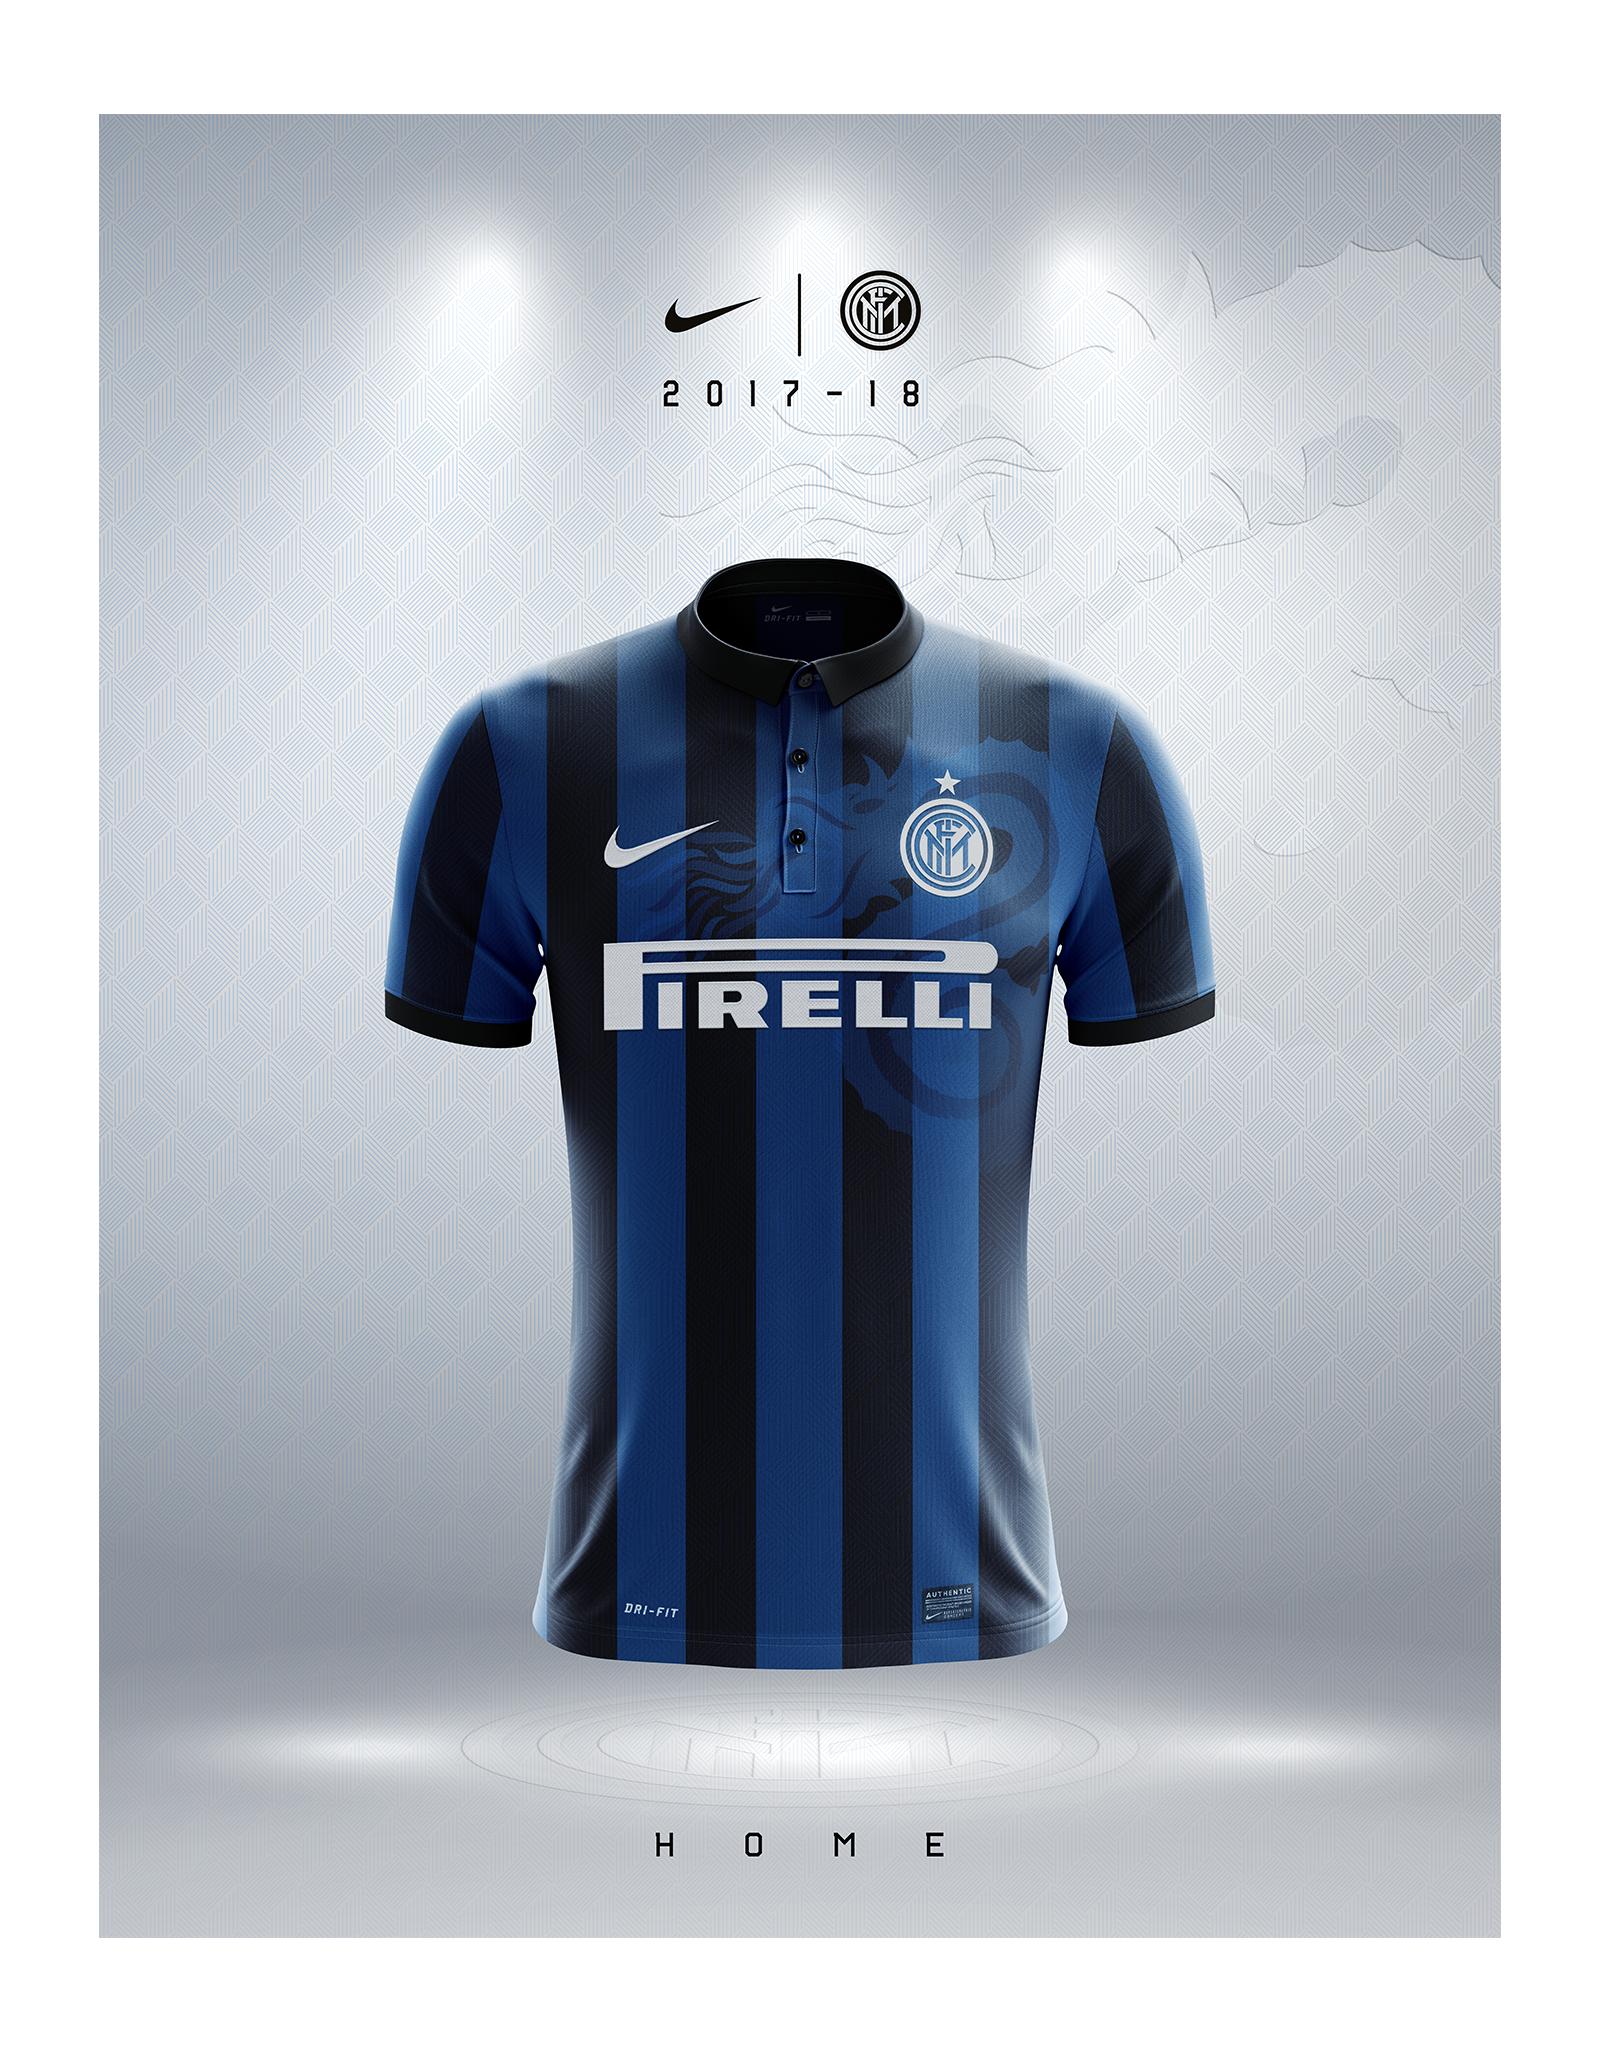 official photos 82a86 3fbdf Snake Concept 2017/18 Inter Shirts | Nike on Behance